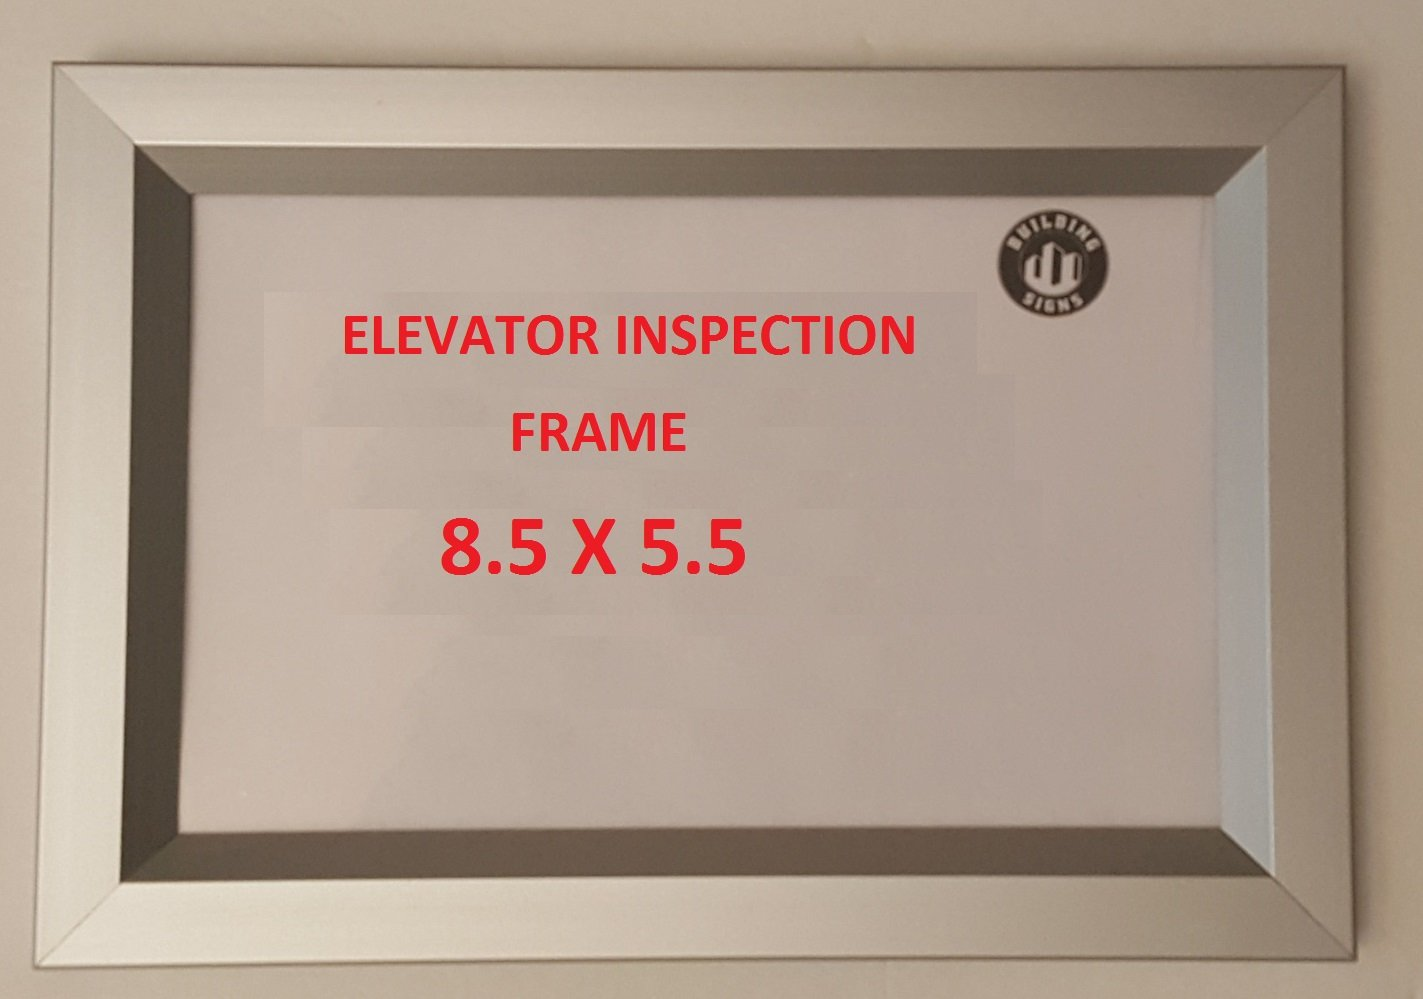 Elevator inspection frame 8.5 x 5.5 ( Heavy Duty - Aluminum)